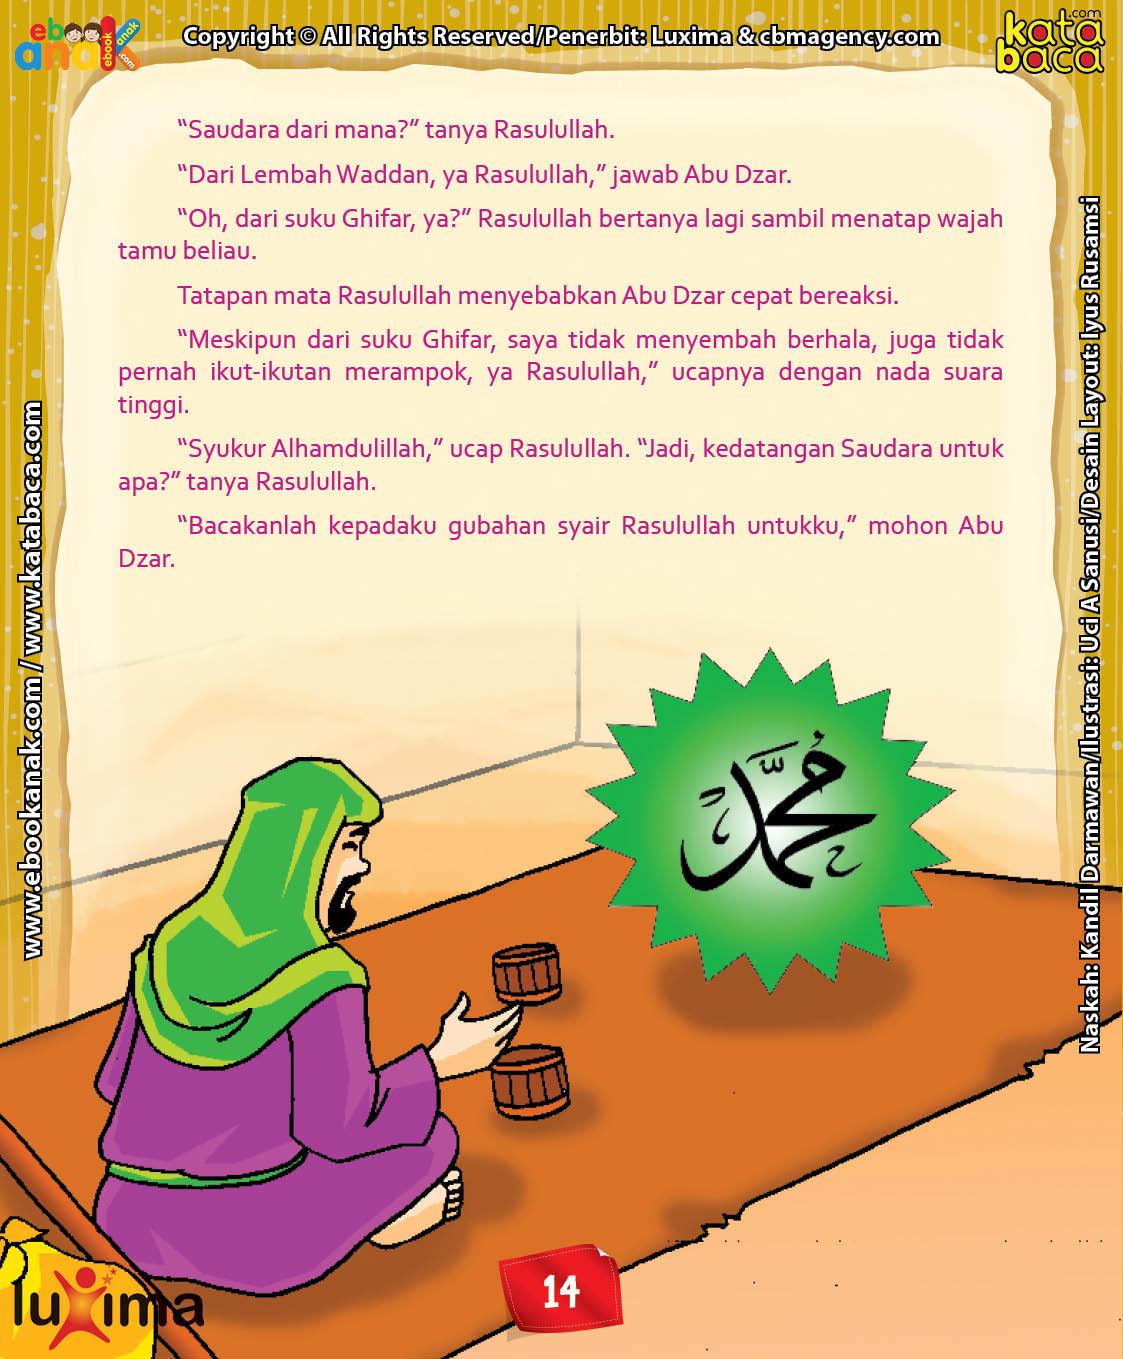 Download Ebook Abu Dzar Al Ghifari, Bagaimana Cara Abu Dzar Masuk Islam